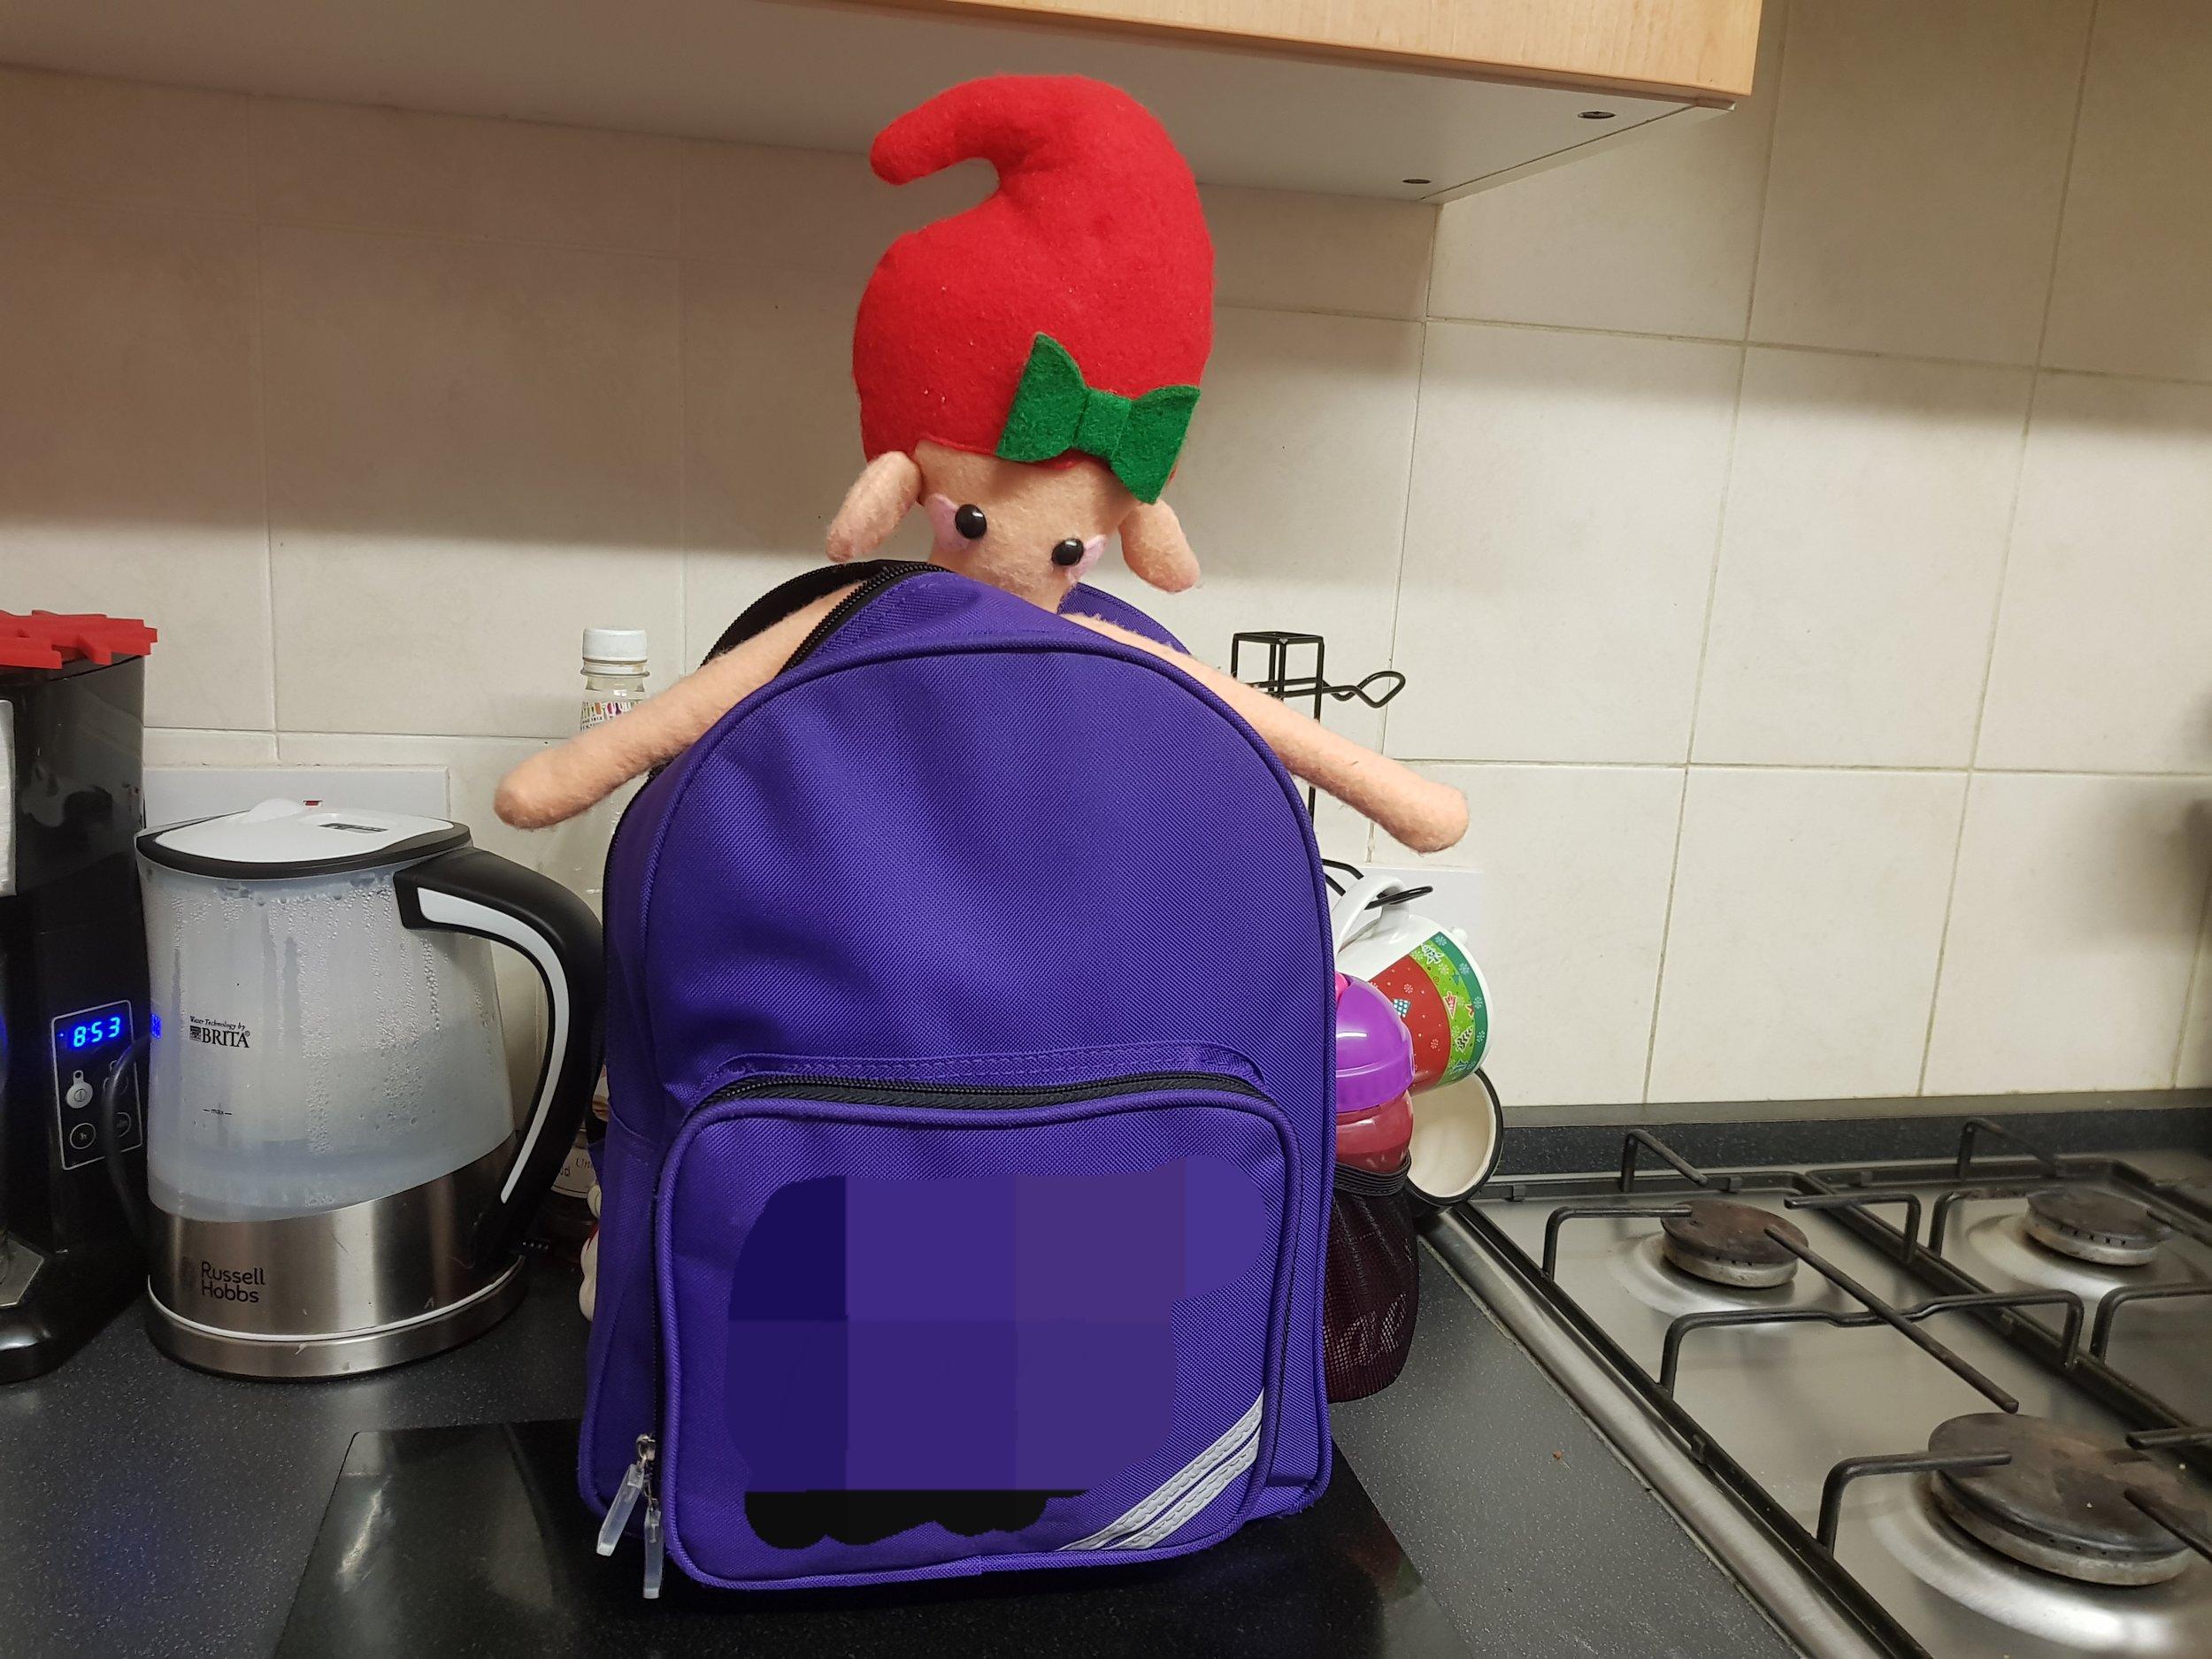 Elf on the Shelf school Chritmas party